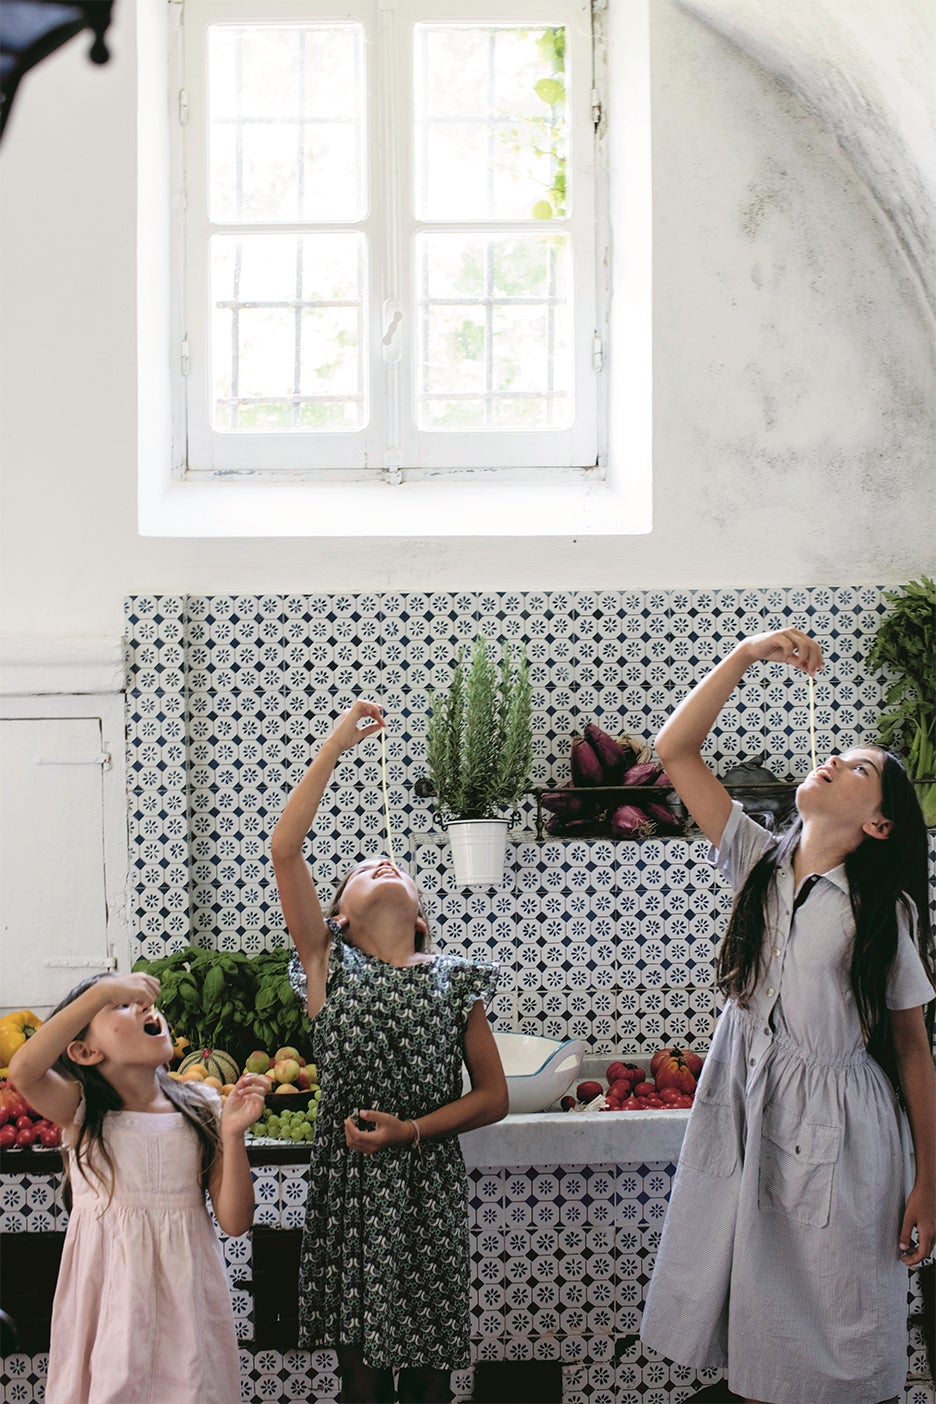 kids in kitchen eating pasta